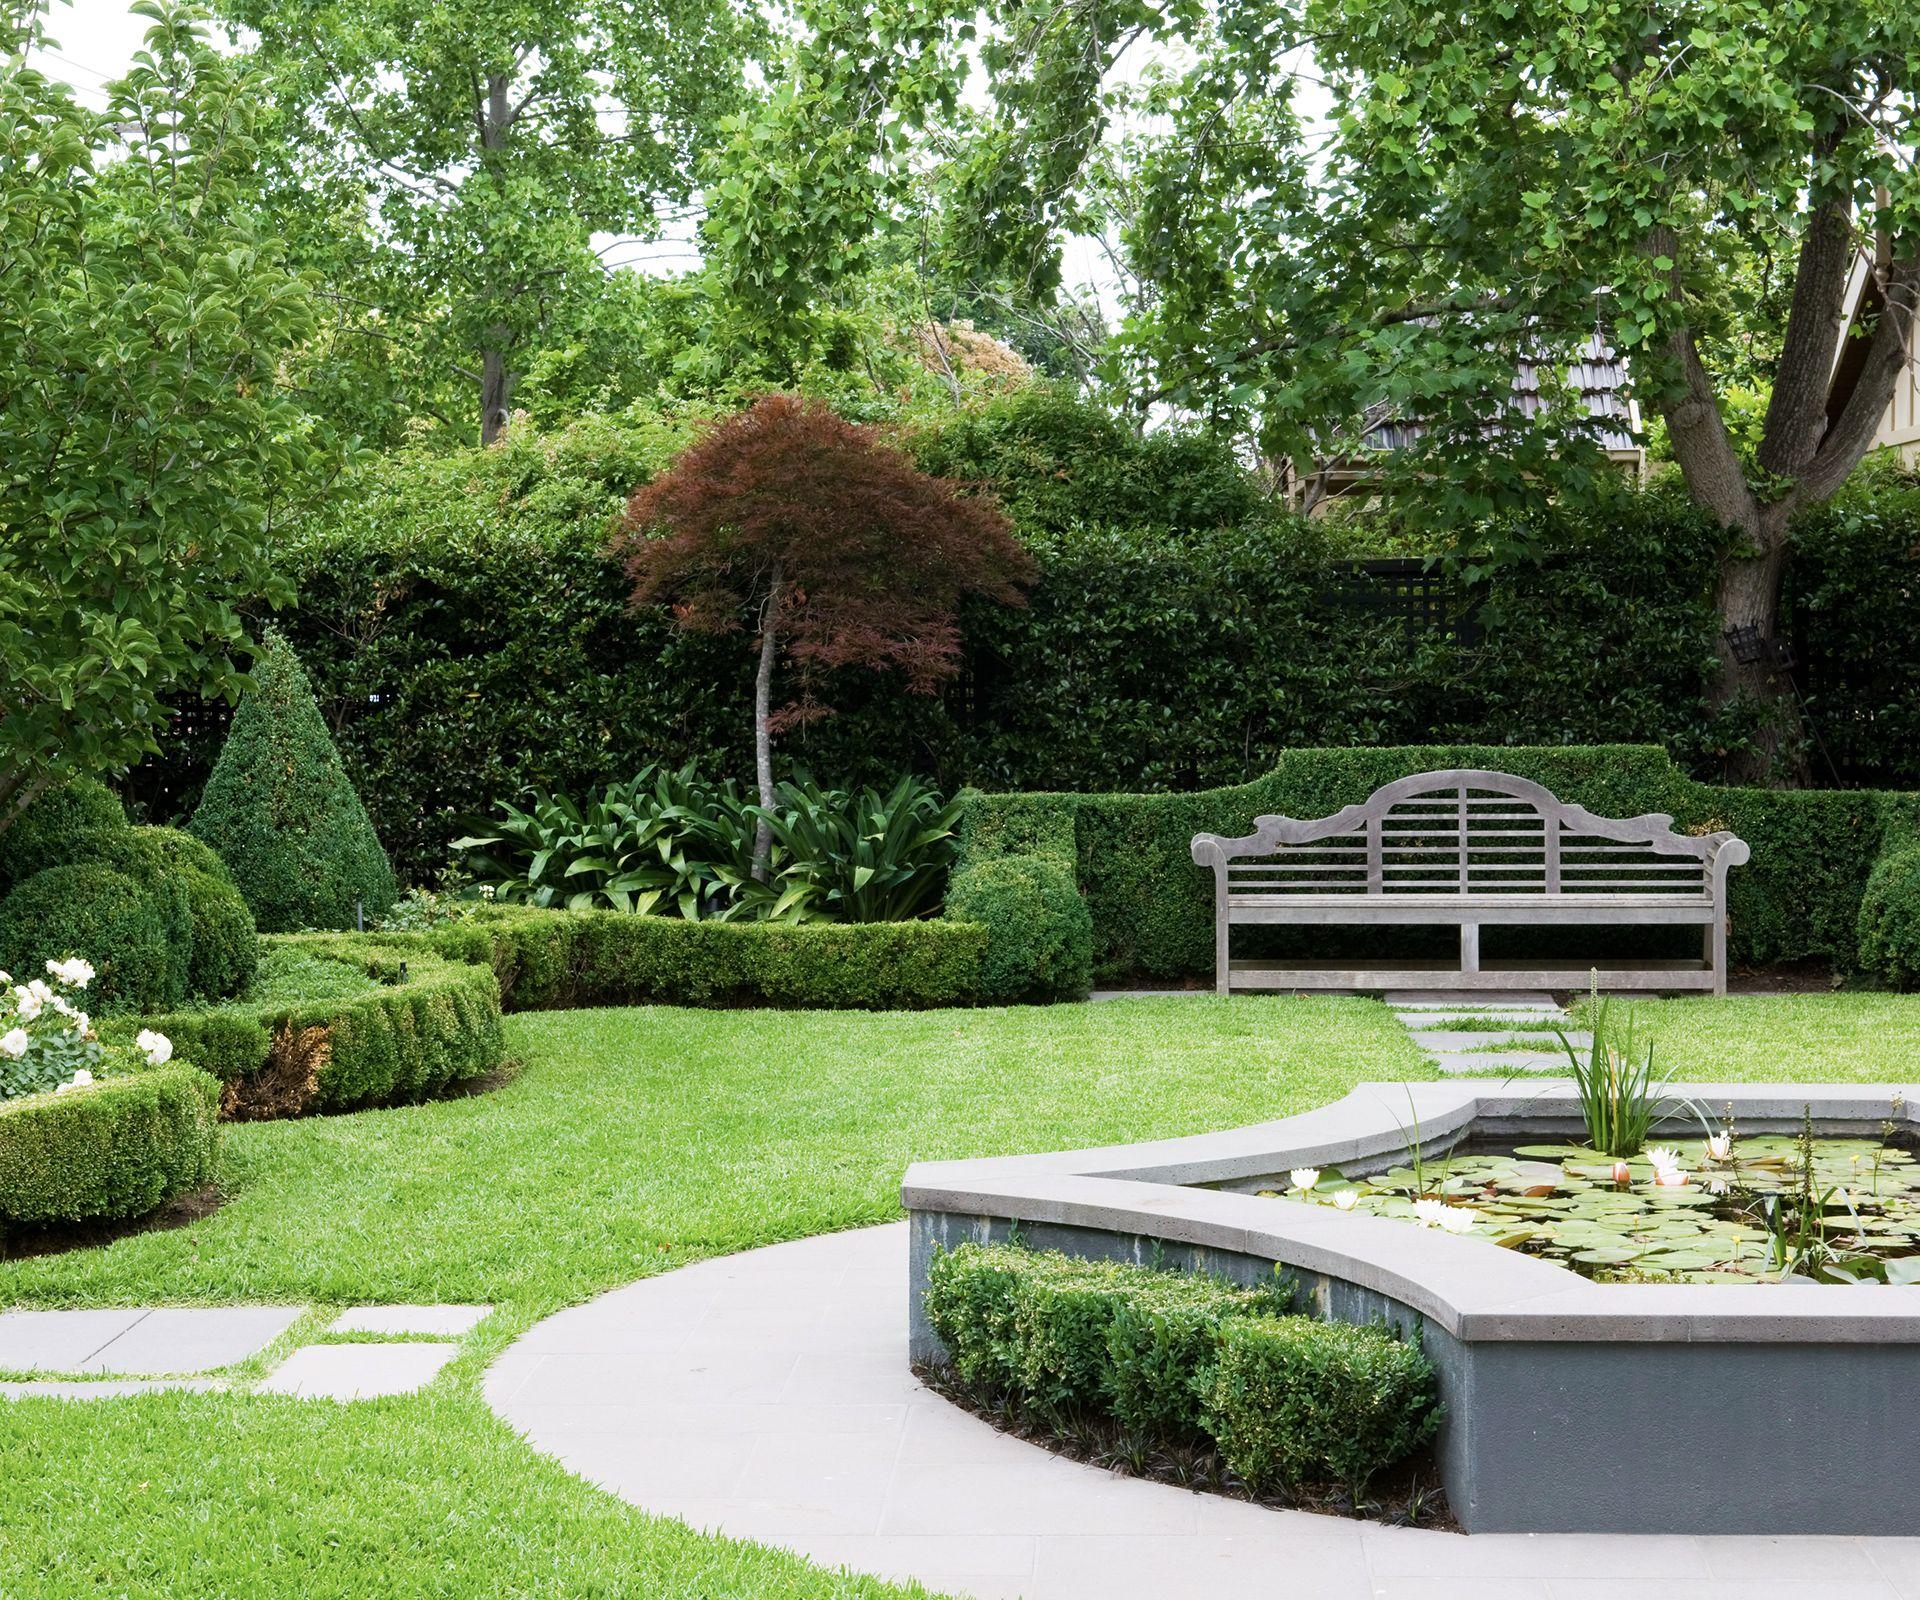 5 elements needed to create a formal garden Garden